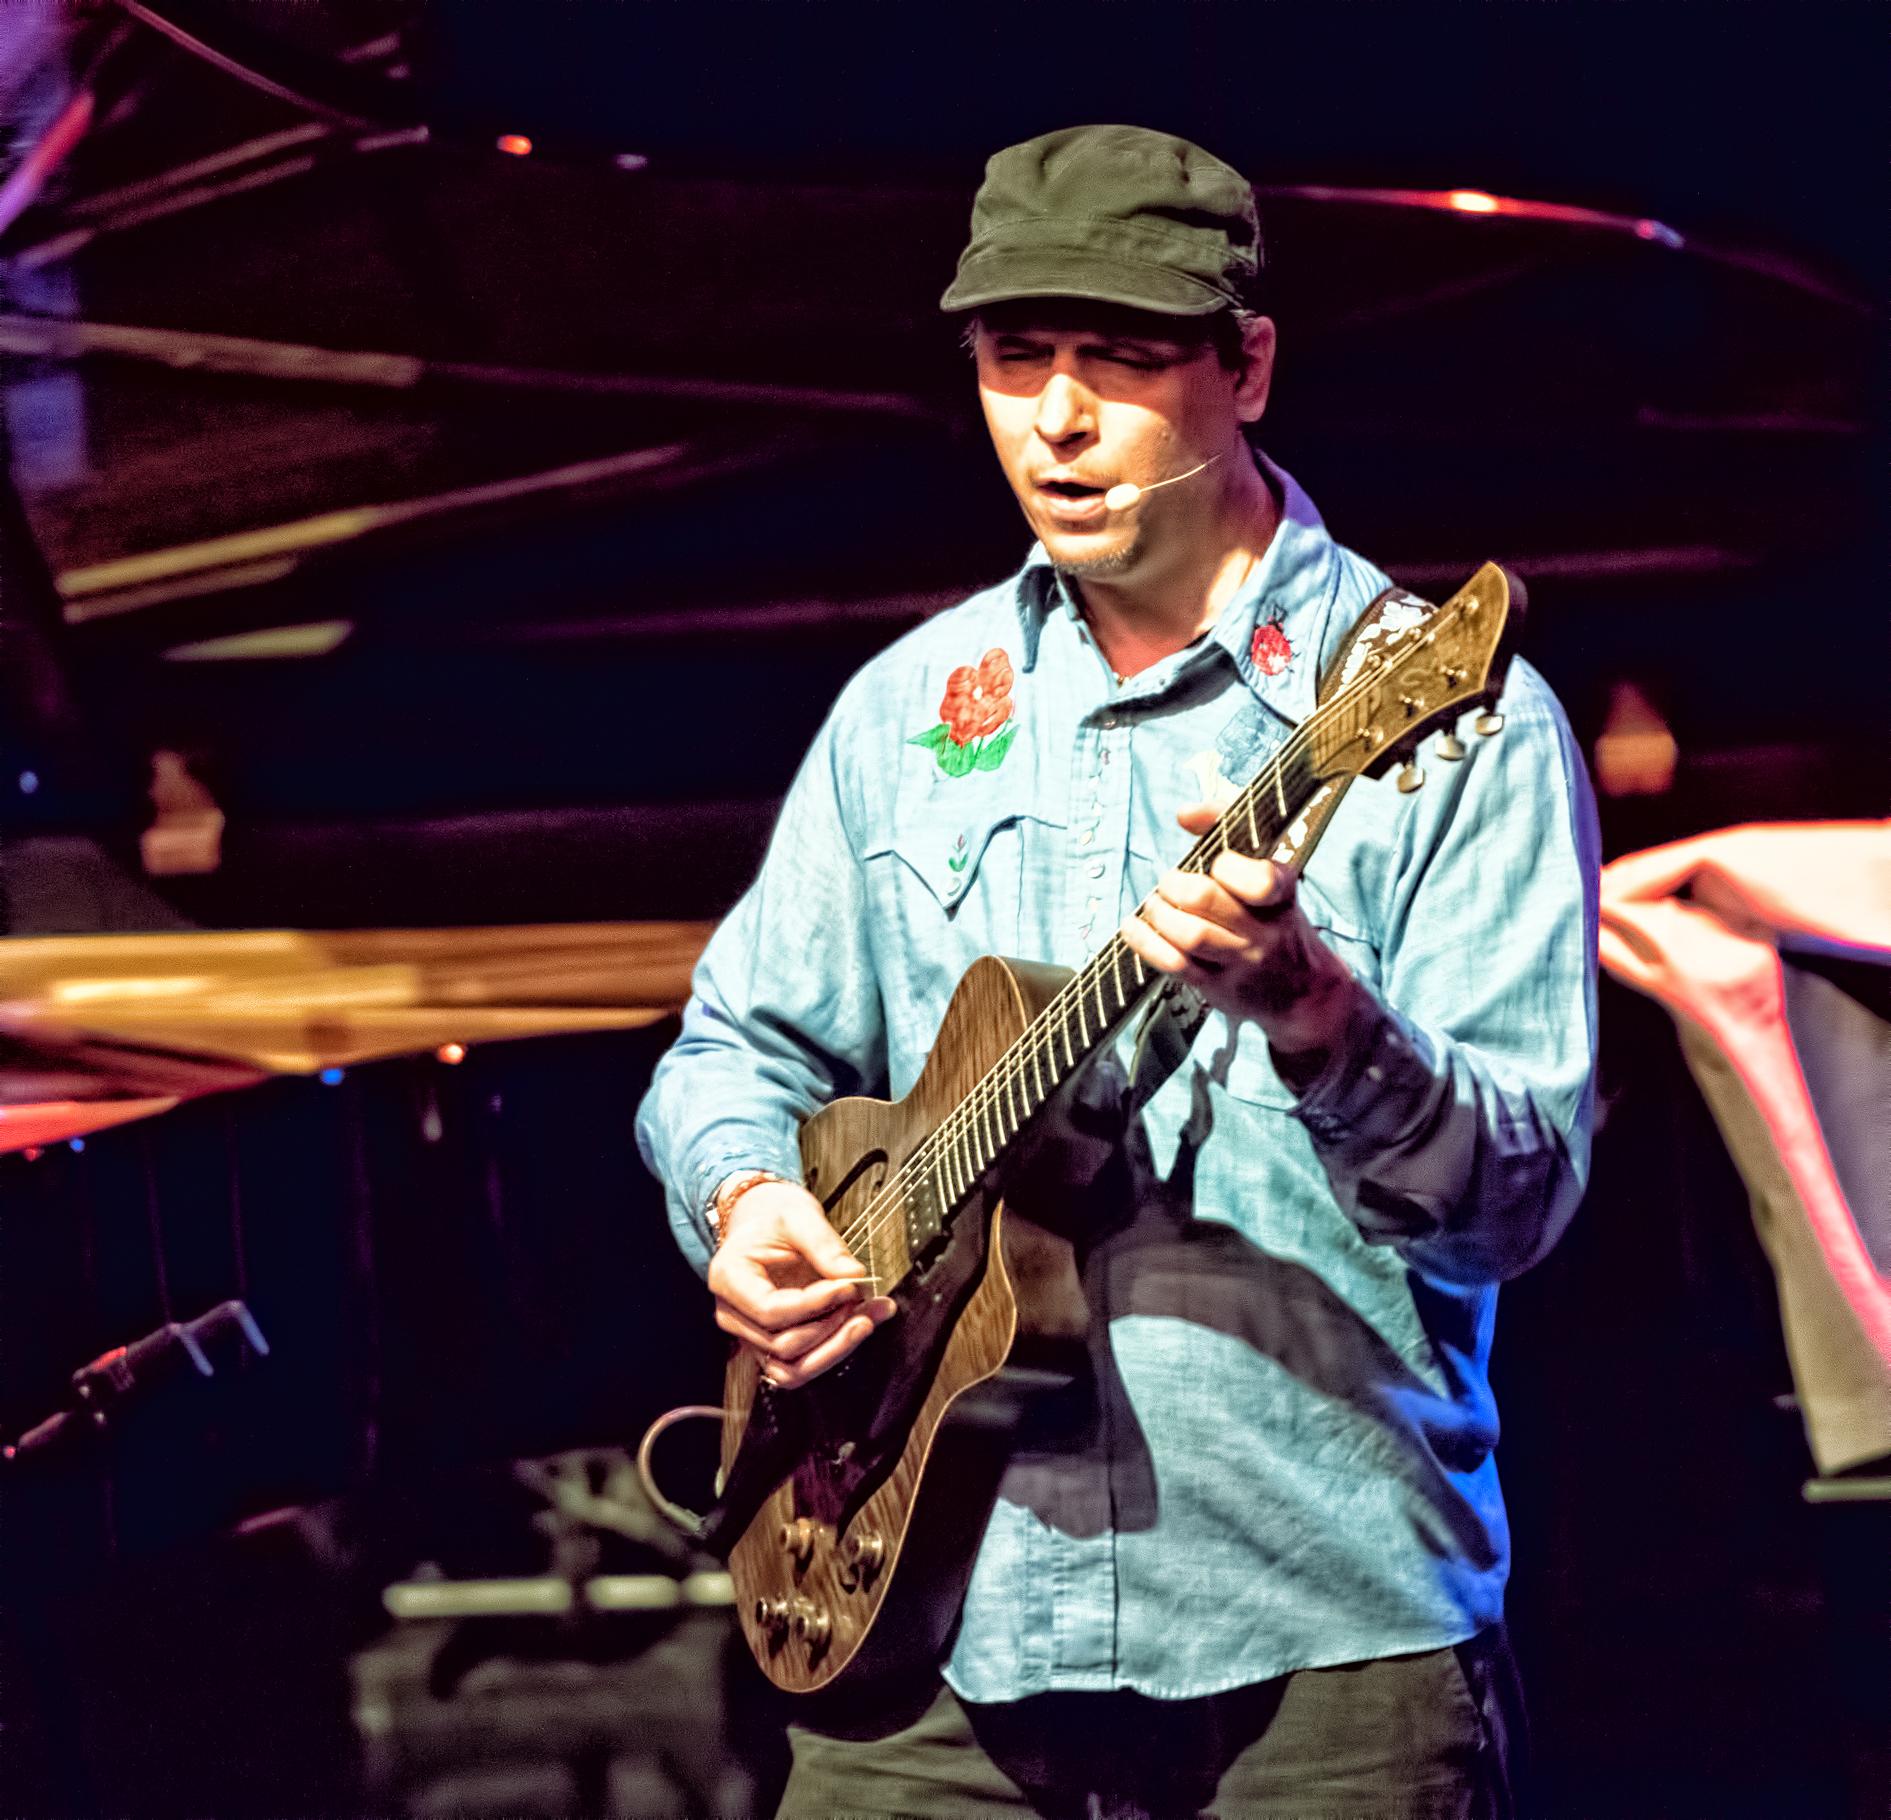 Kurt Rosenwinkel at the Montreal International Jazz Festival 2015